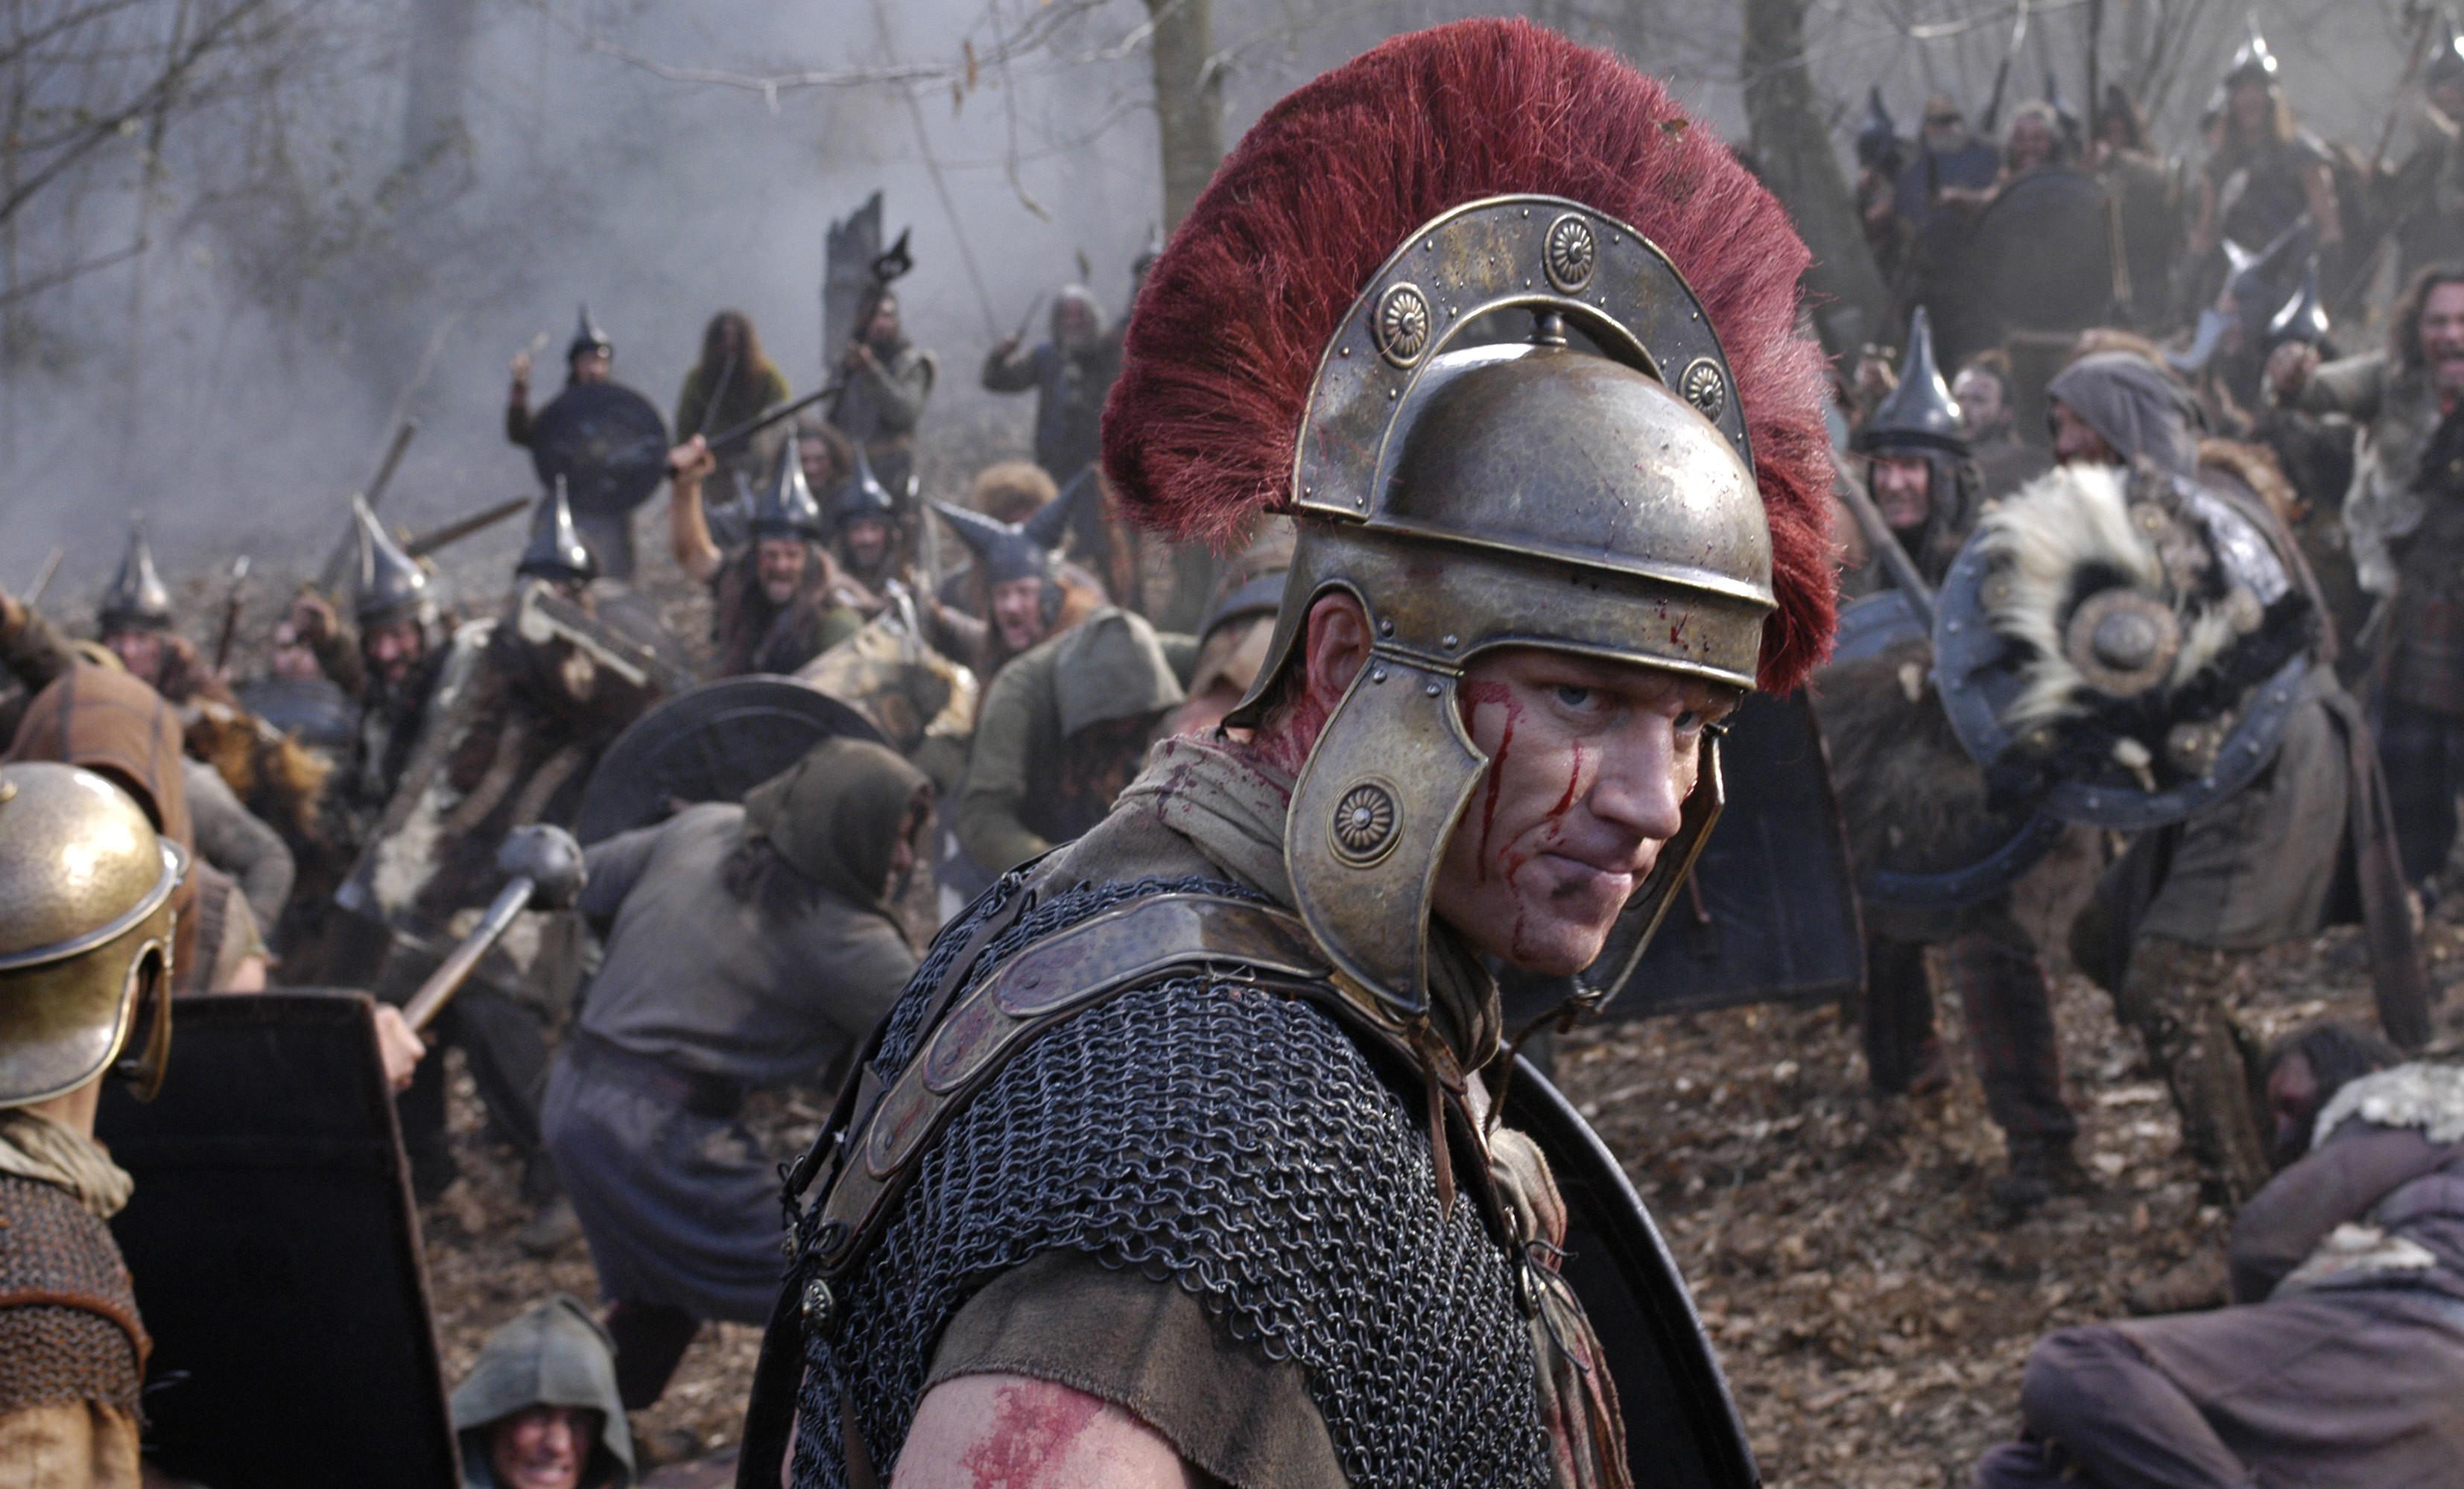 498679b9116b34313fb8a0e5a0a2d076.jpg (3307×1999) | Legions of Rome |  Pinterest | Rome, Roman legion and Ancient rome